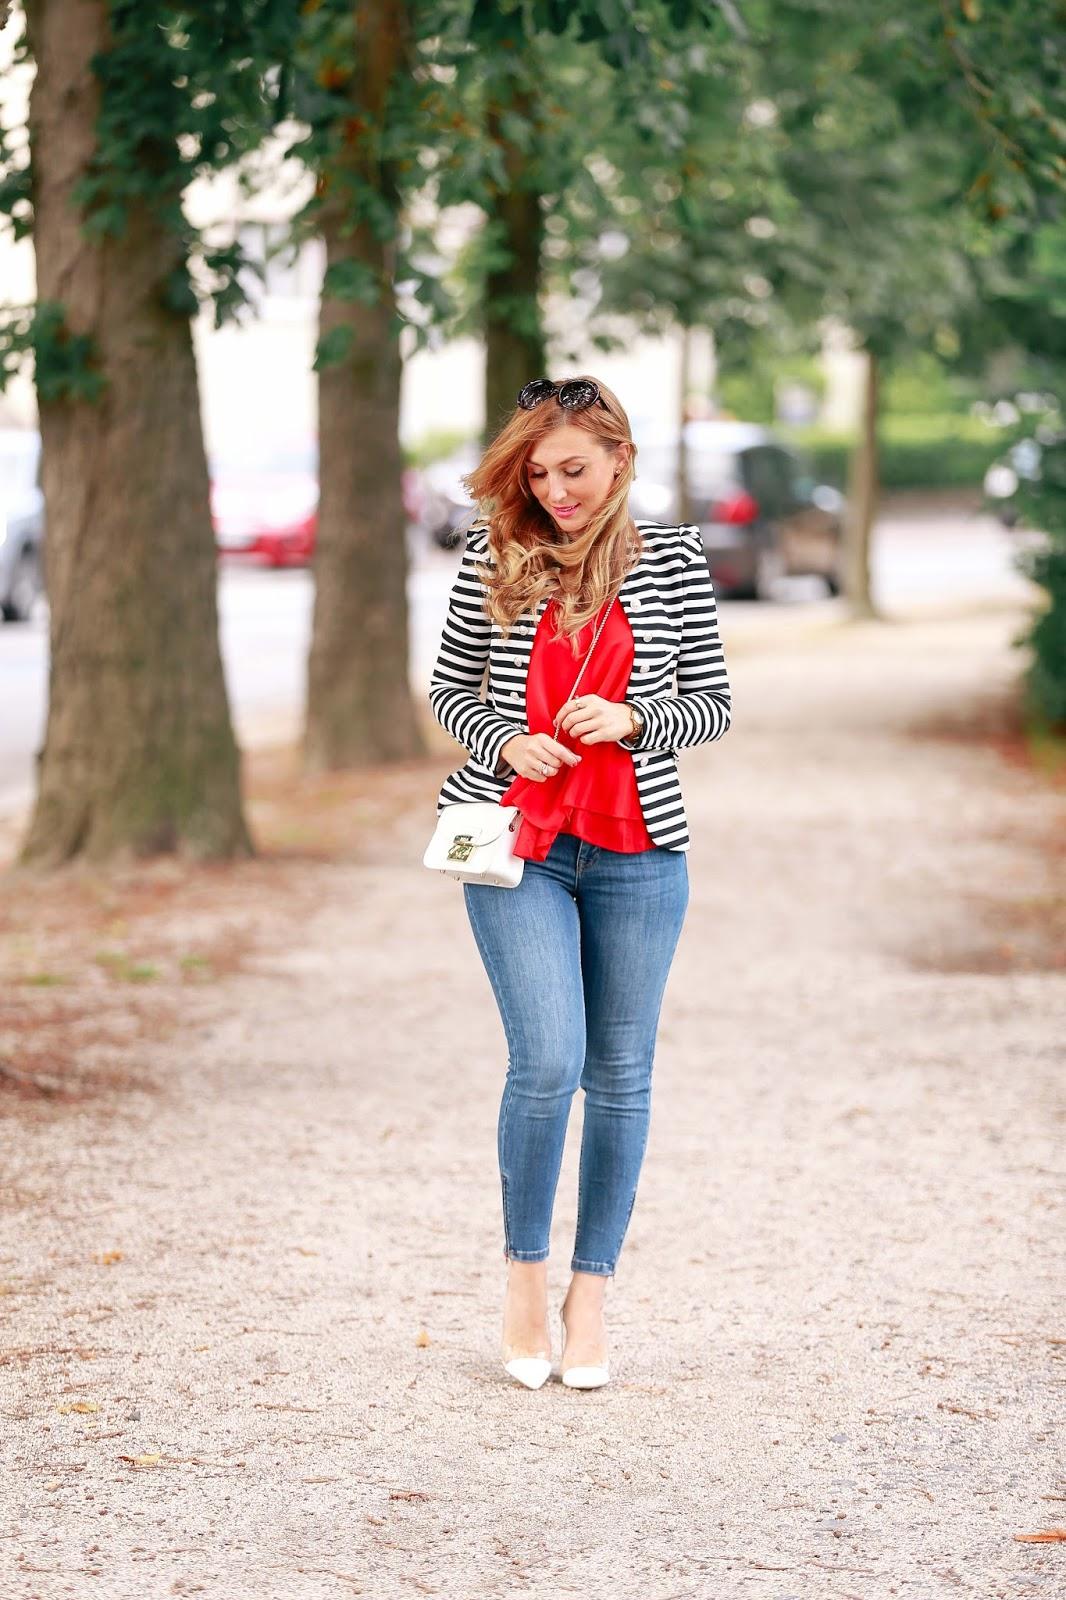 Blogger-Fashionblog-Outfit-Modeblog-München-deutsche-Fashionblogger-Off-Shoulder-Carmen-Top-Forever-21-Spitzenrock-Deutschland-Zara